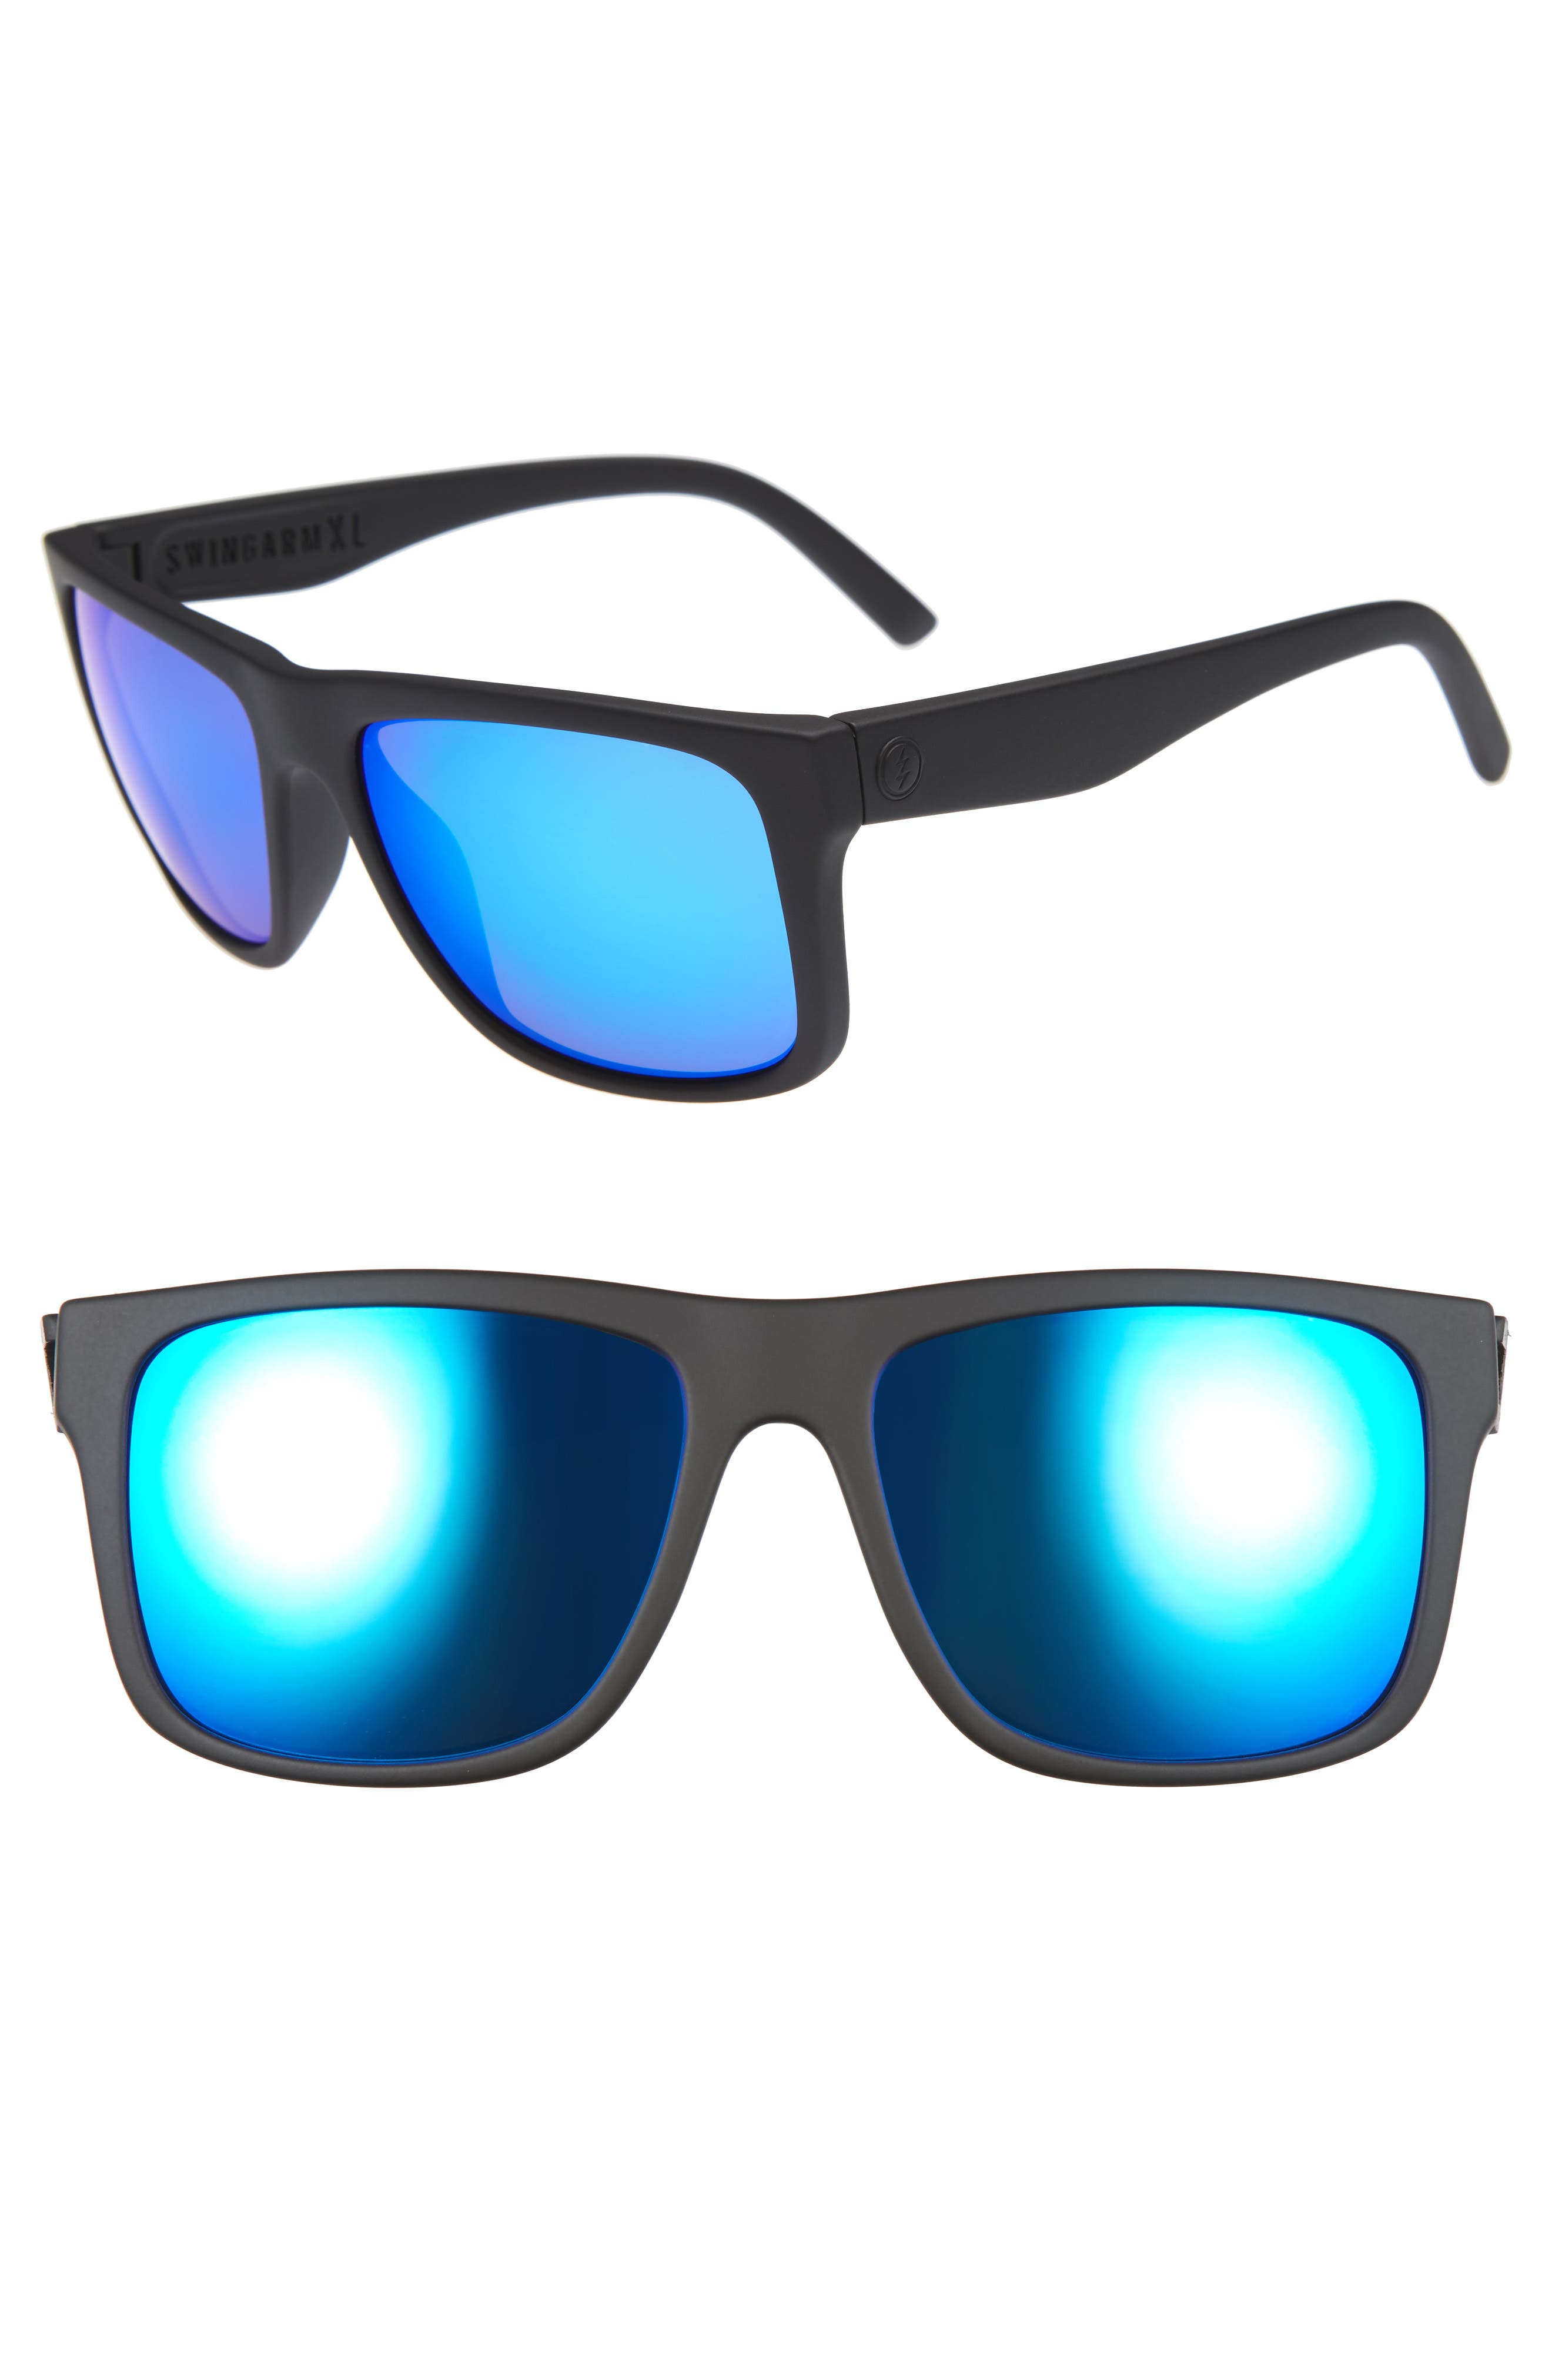 Swingarm XL 59mm Sunglasses,                             Main thumbnail 1, color,                             001